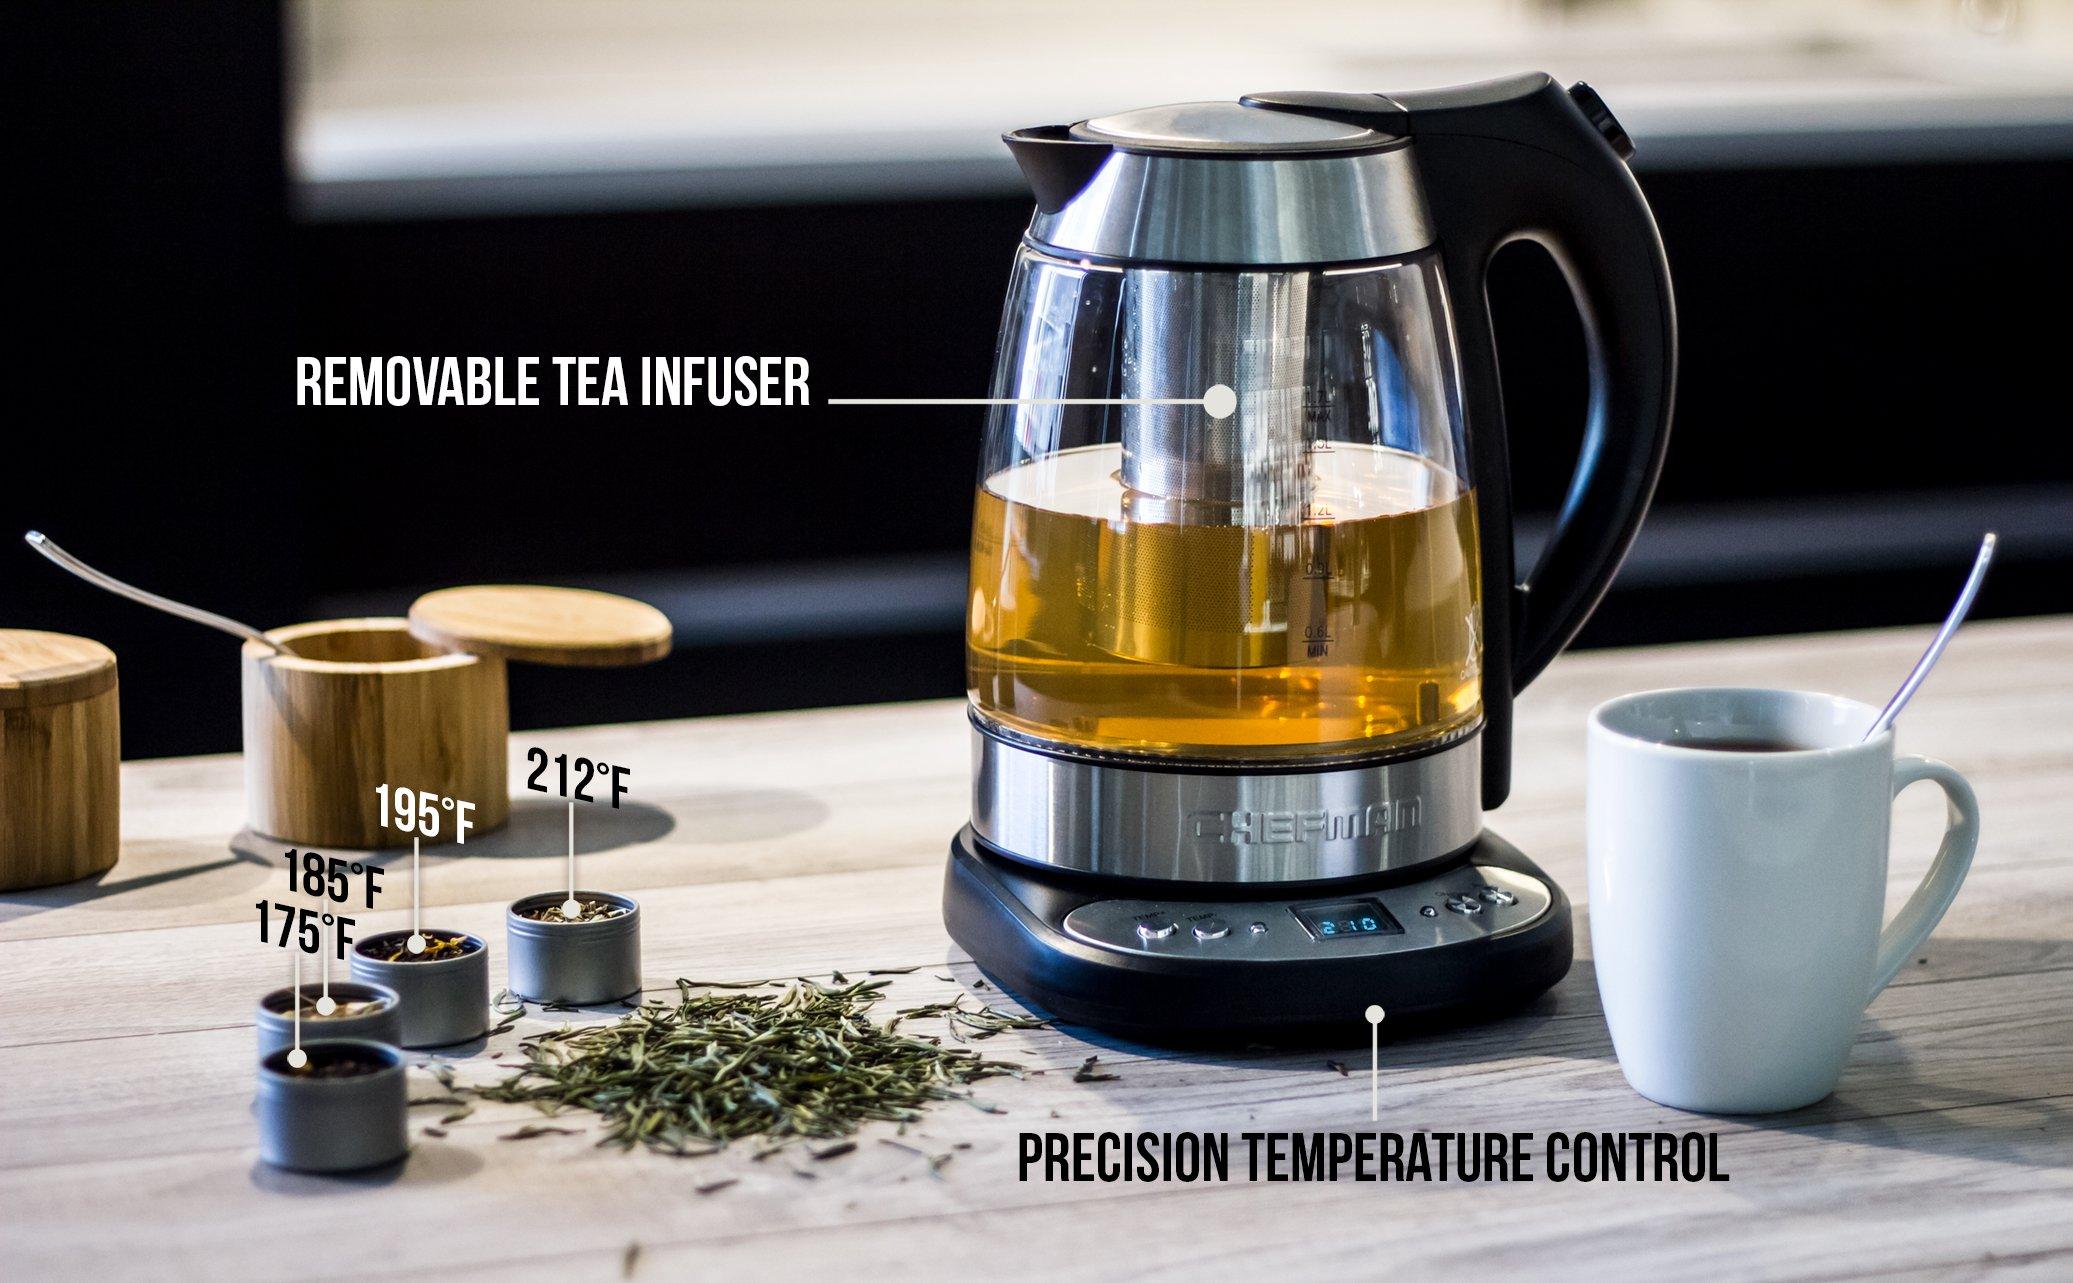 chefman electric glass digital tea kettle with free tea infuser built in 856432005065 ebay. Black Bedroom Furniture Sets. Home Design Ideas